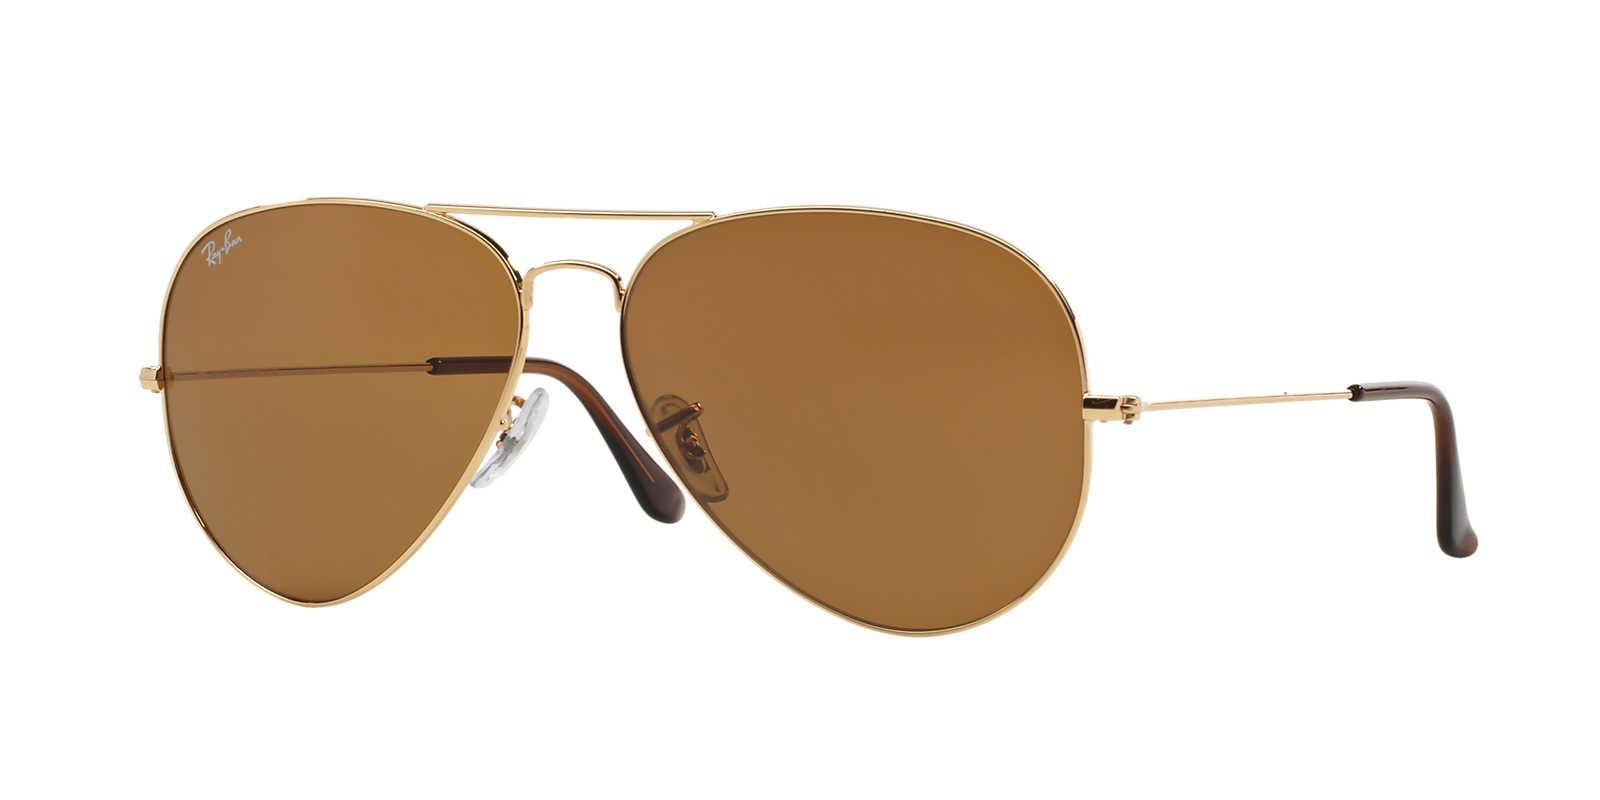 Ray Ban Women's RB 3025 001/33 B-15 lens Aviator Sunglasses 58mm, Gold